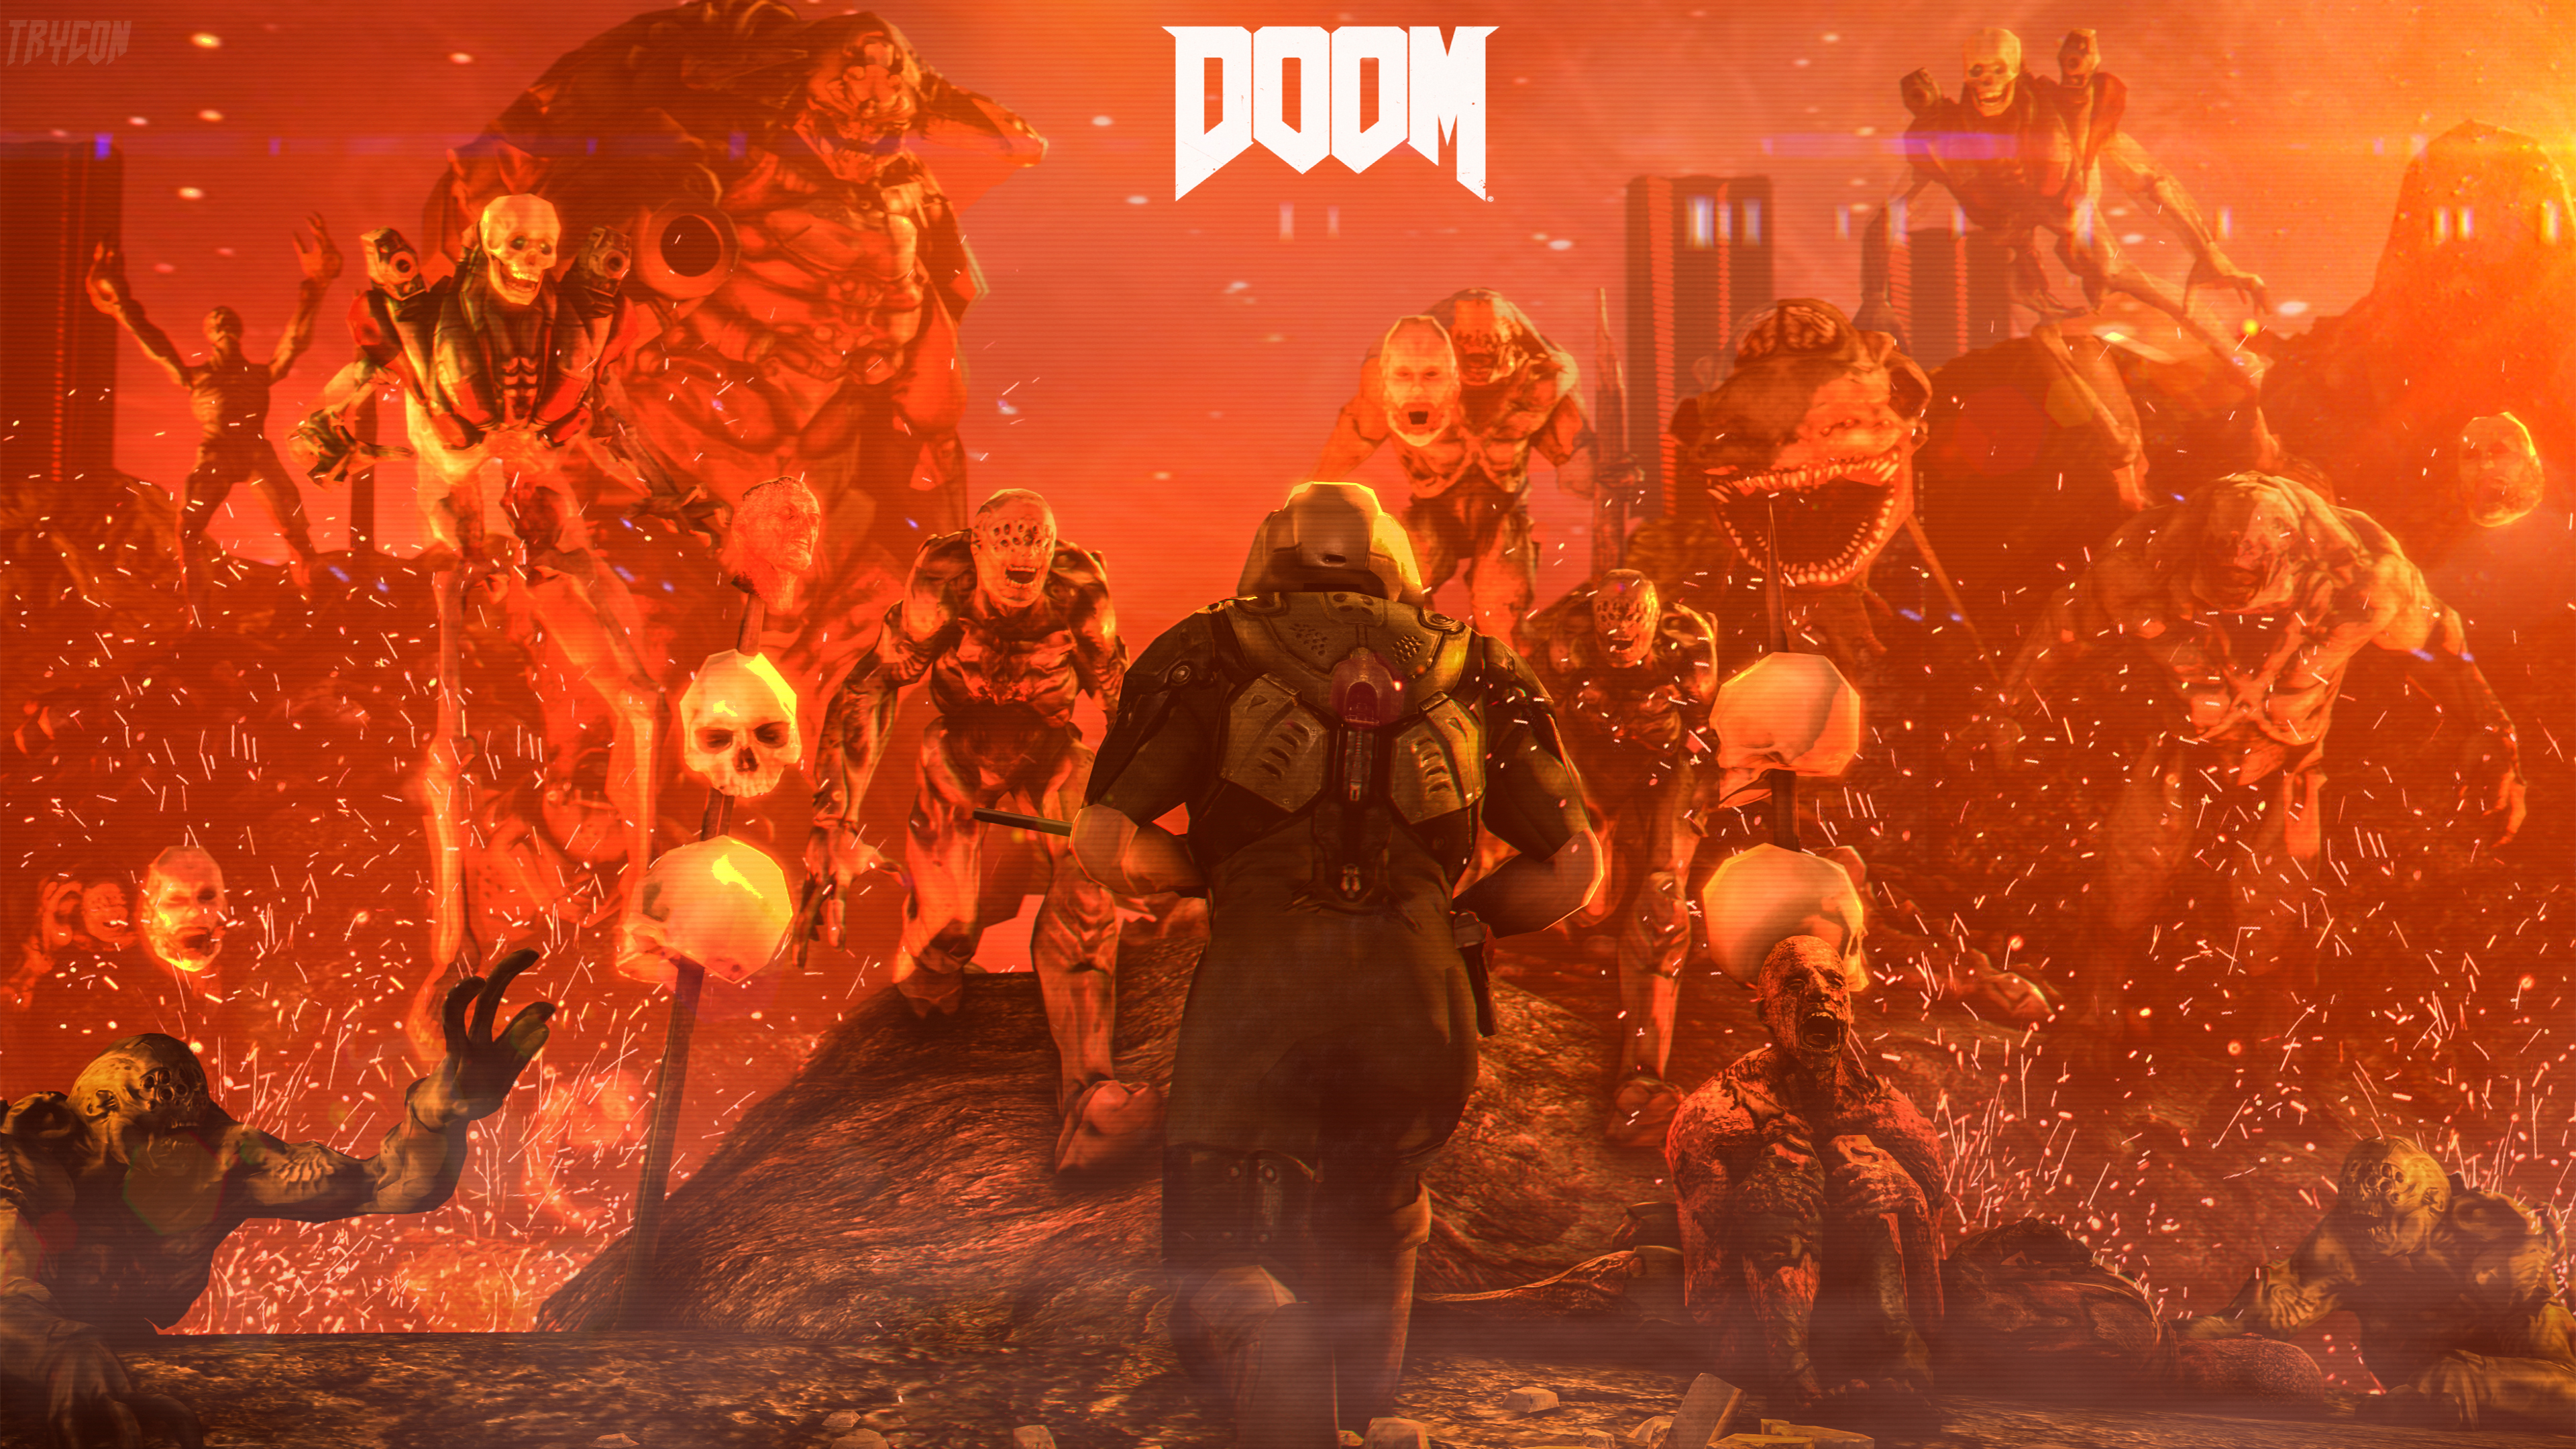 the art of doom pdf